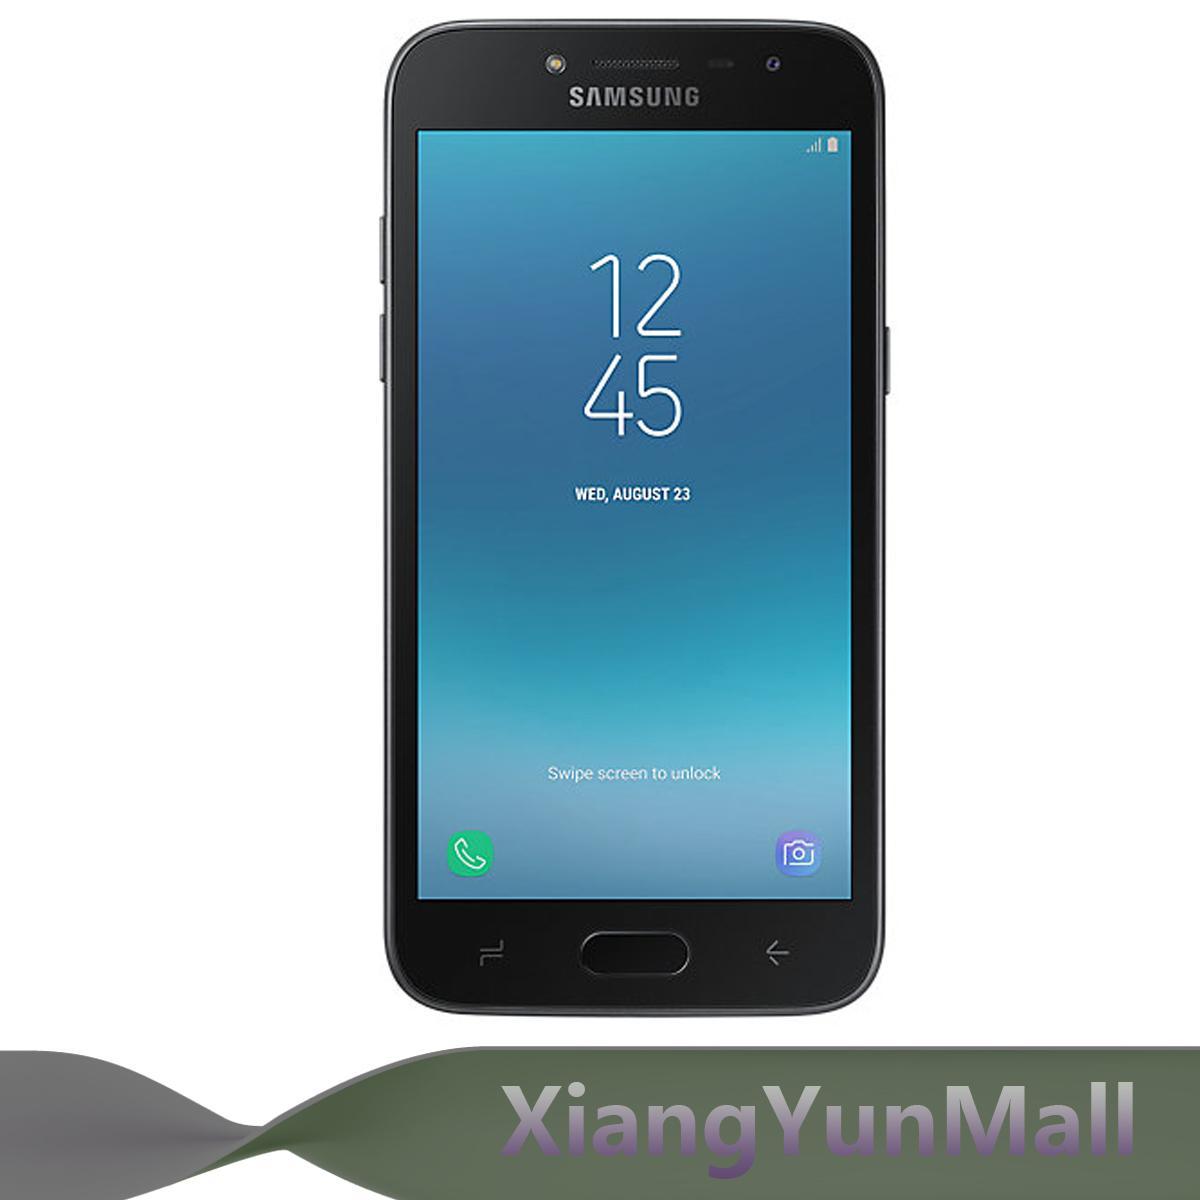 SAMSUNG J2pro 1.5GRAM 16GBROM 2018 Ponsel ini menikmati garansi resmi 1 tahun Pengiriman segera!